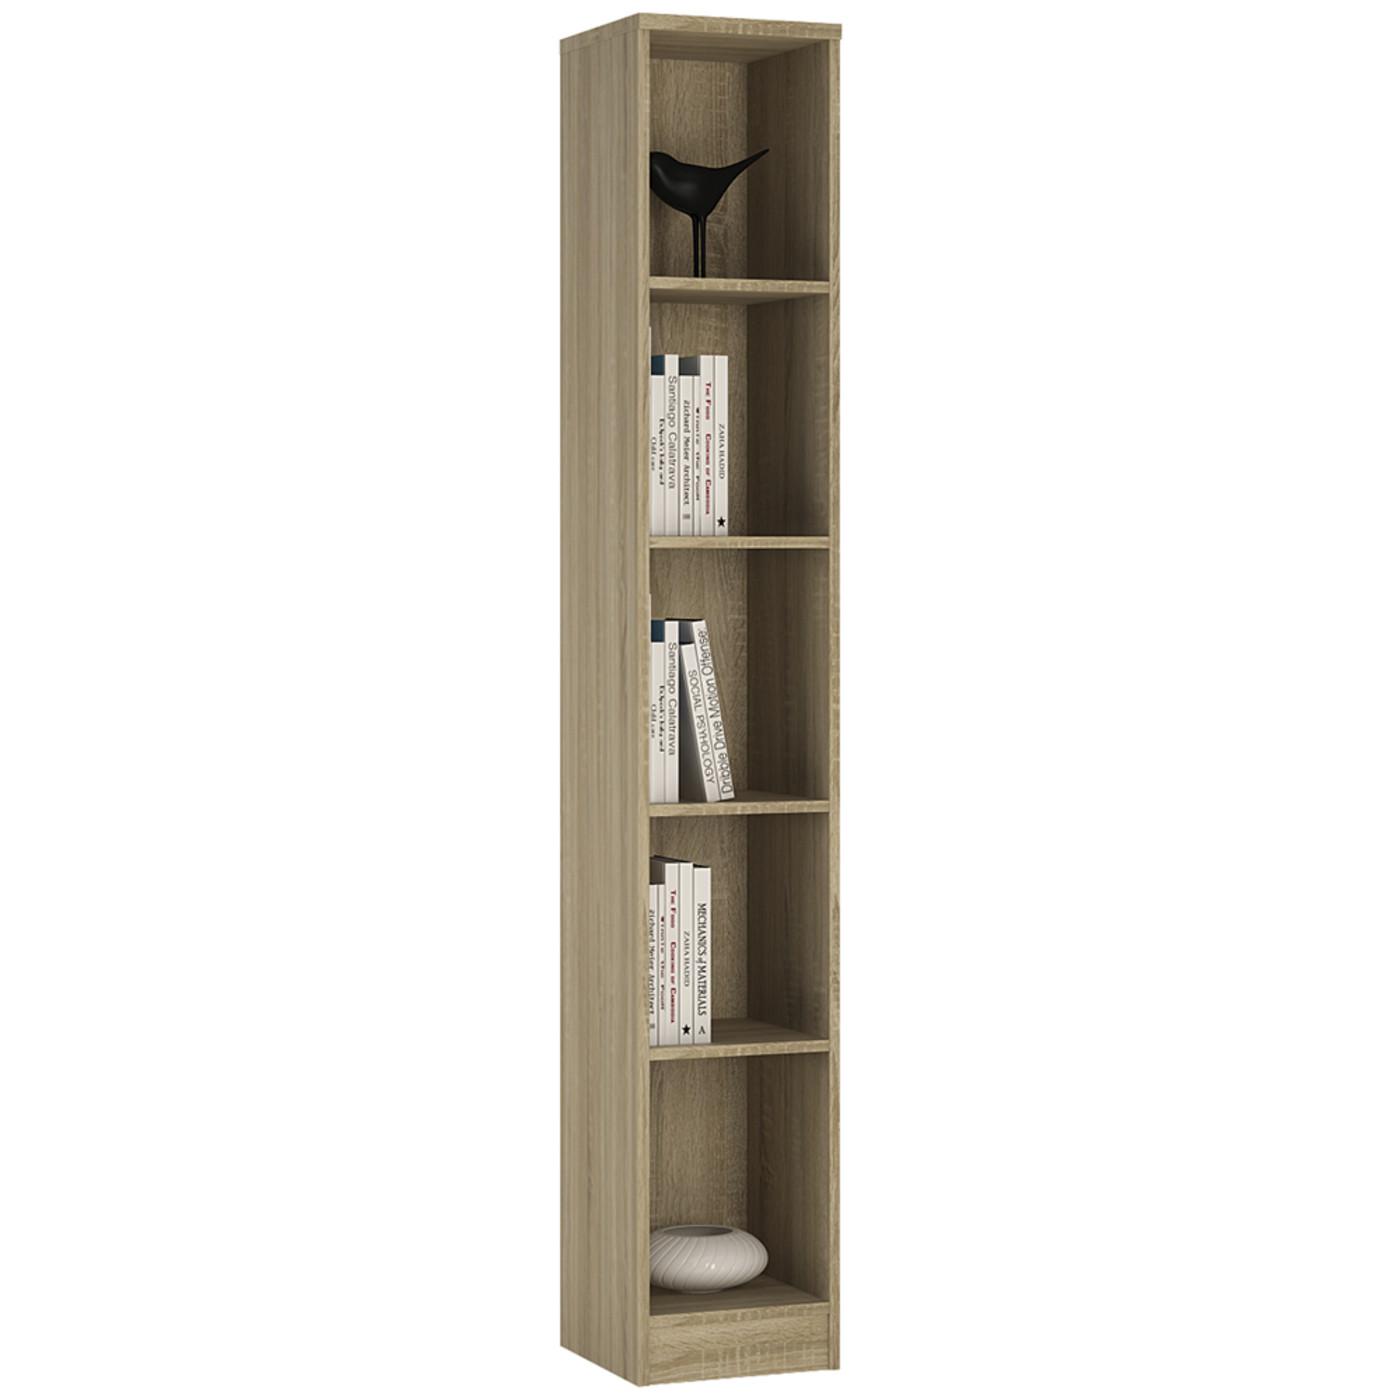 4 You Tall Narrow Bookcase In Sonama Oak Pearl White Canyon